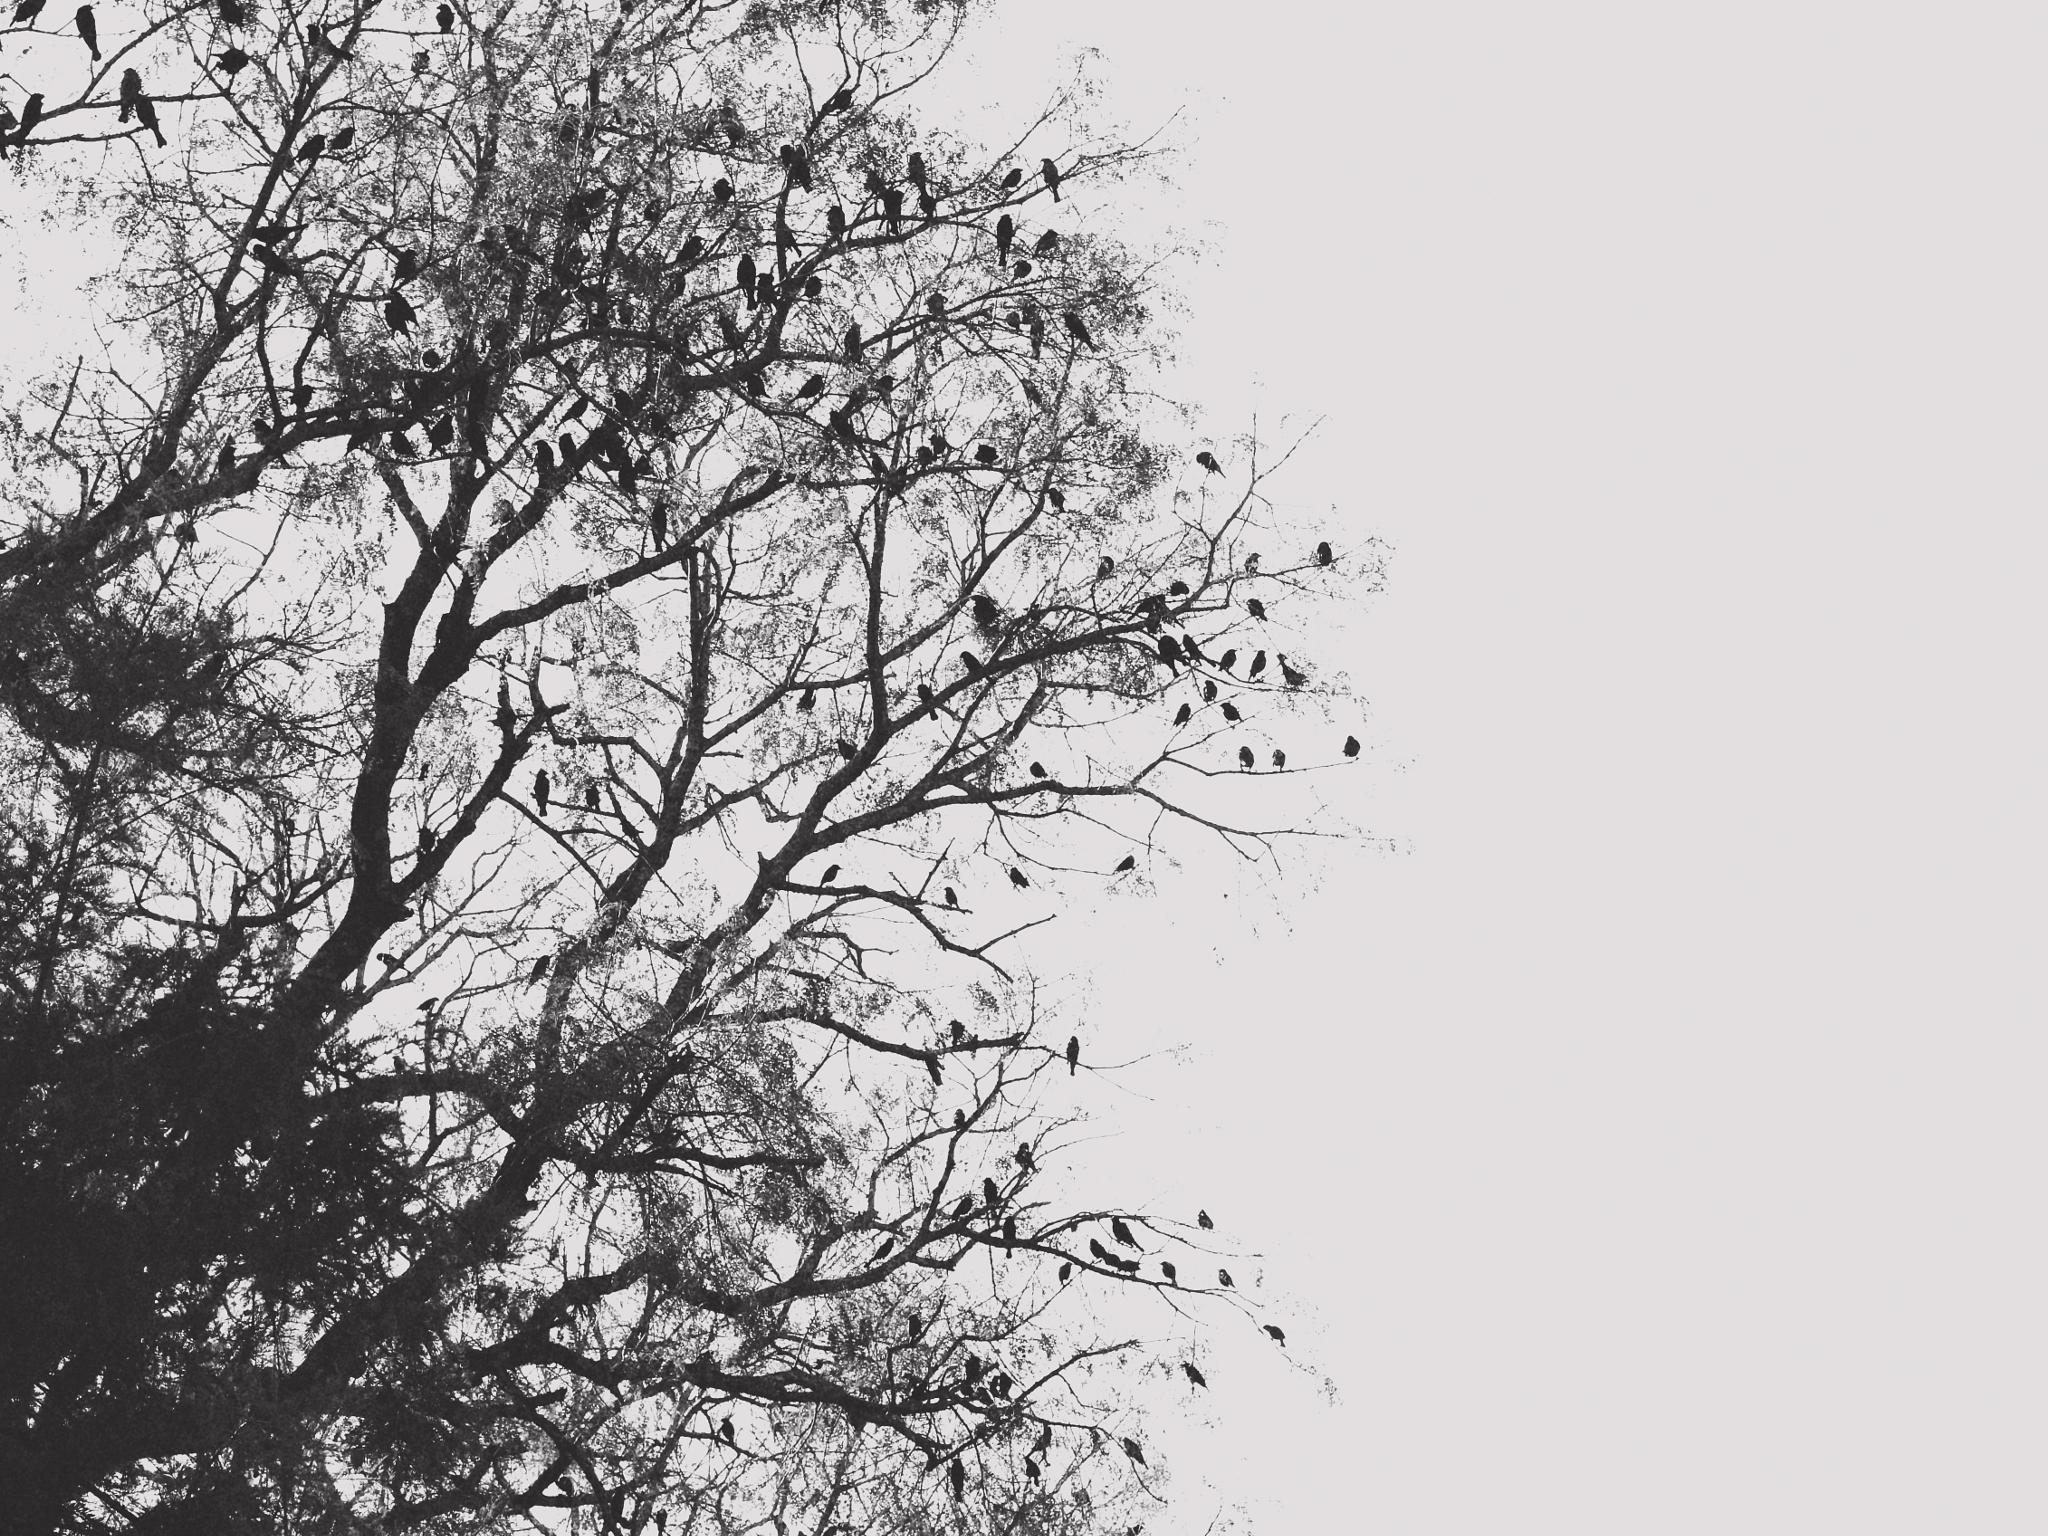 Birds by Marcia Sleiman